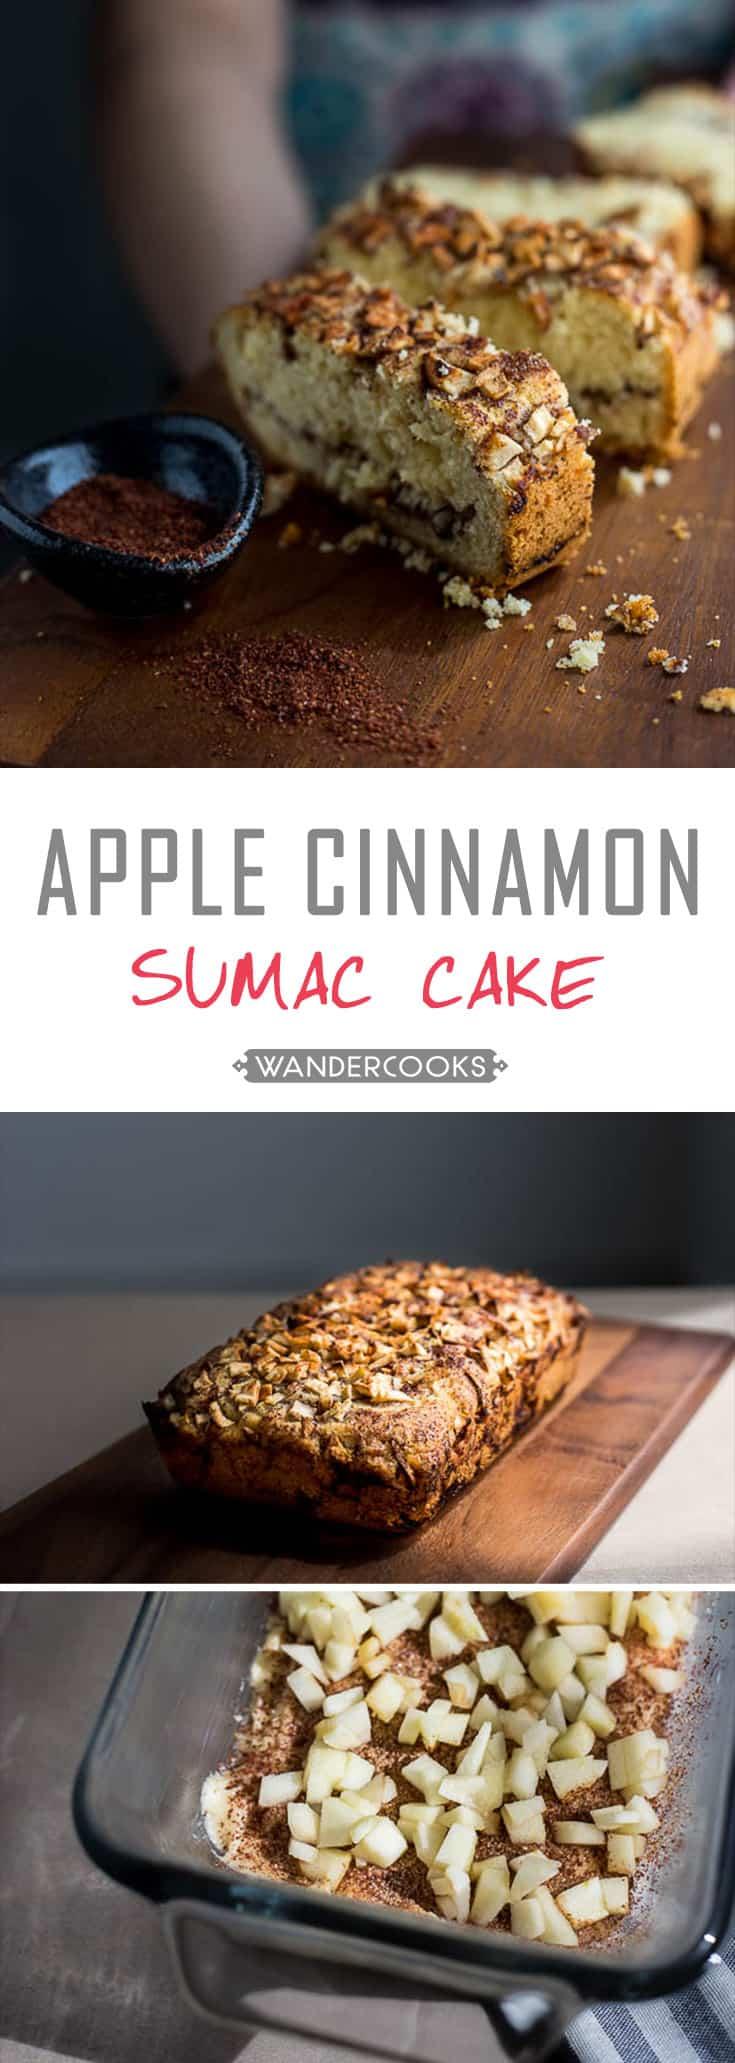 Spiced Apple Cinnamon Sumac Cake